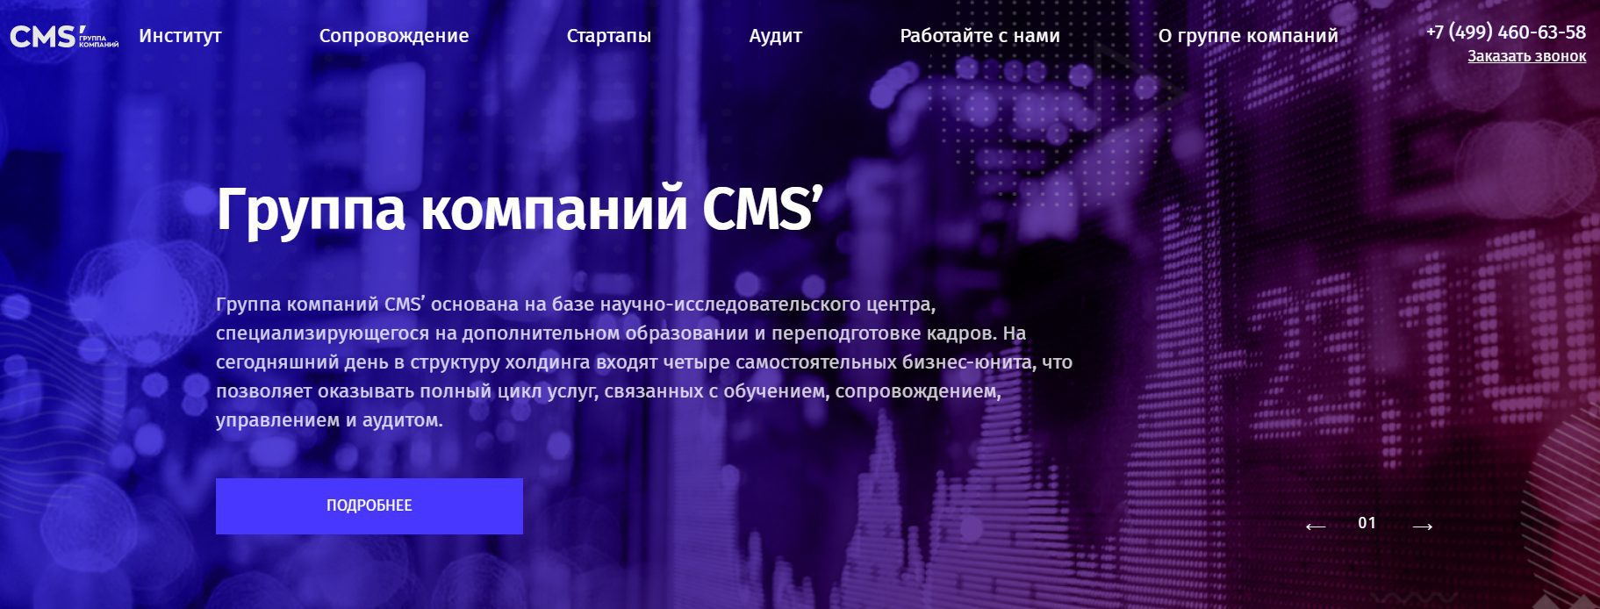 Проект Группа компаний CMS